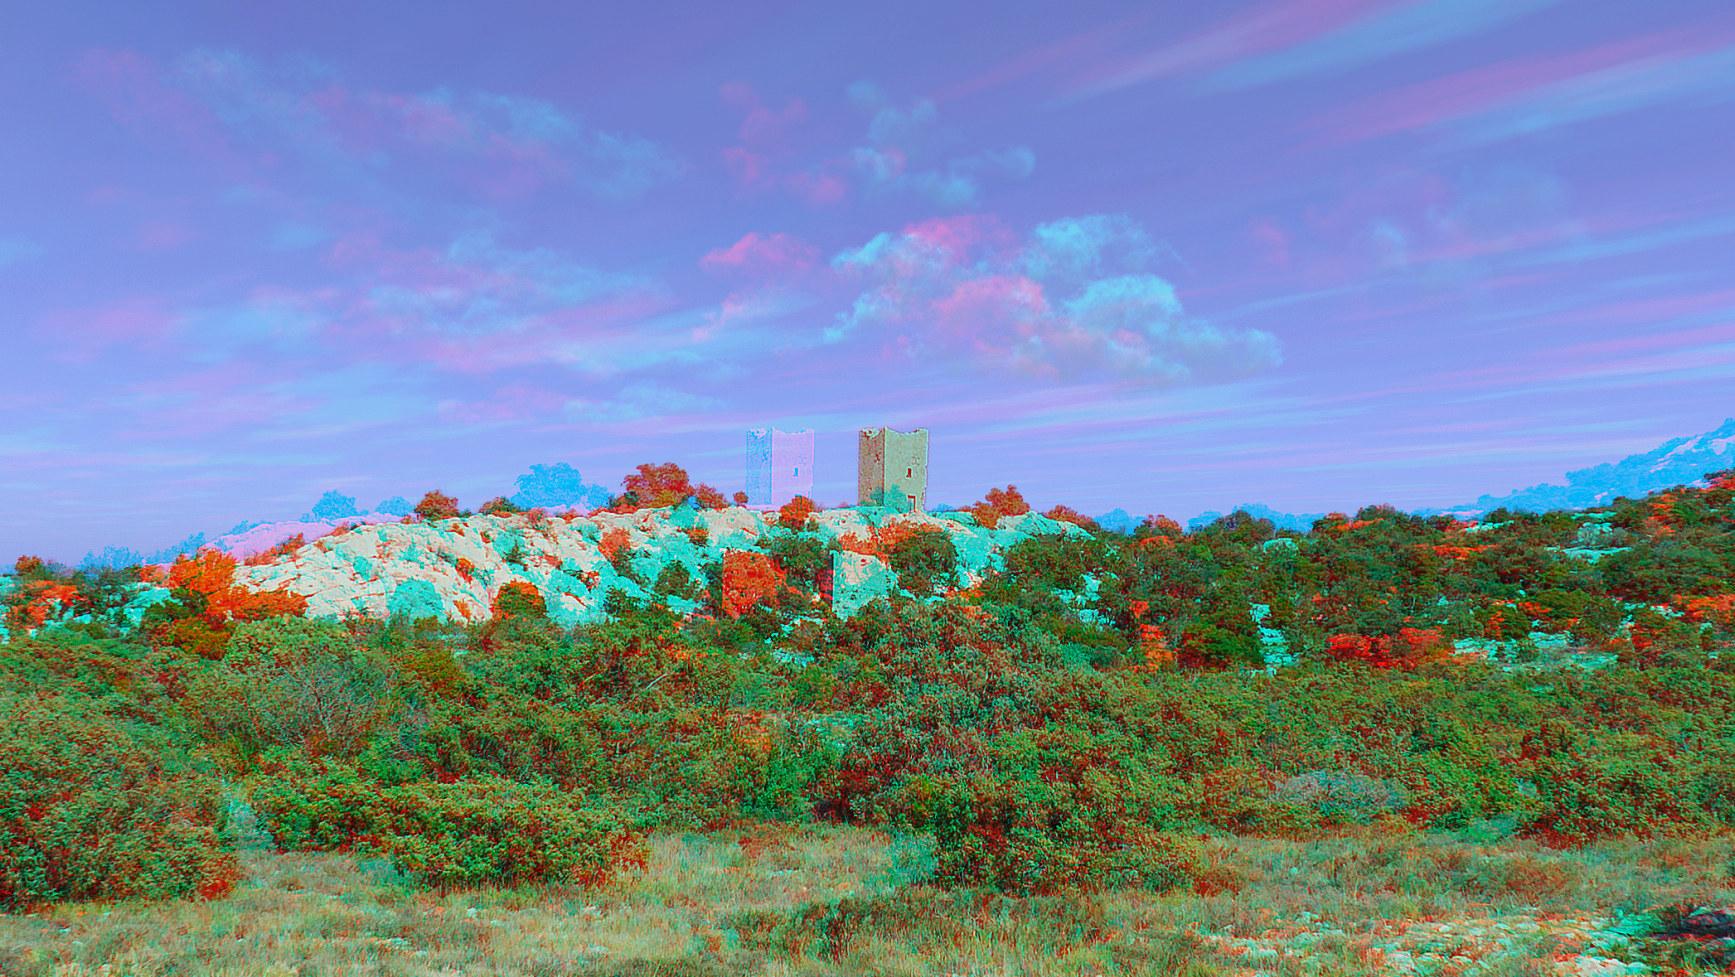 Cazevieille tower